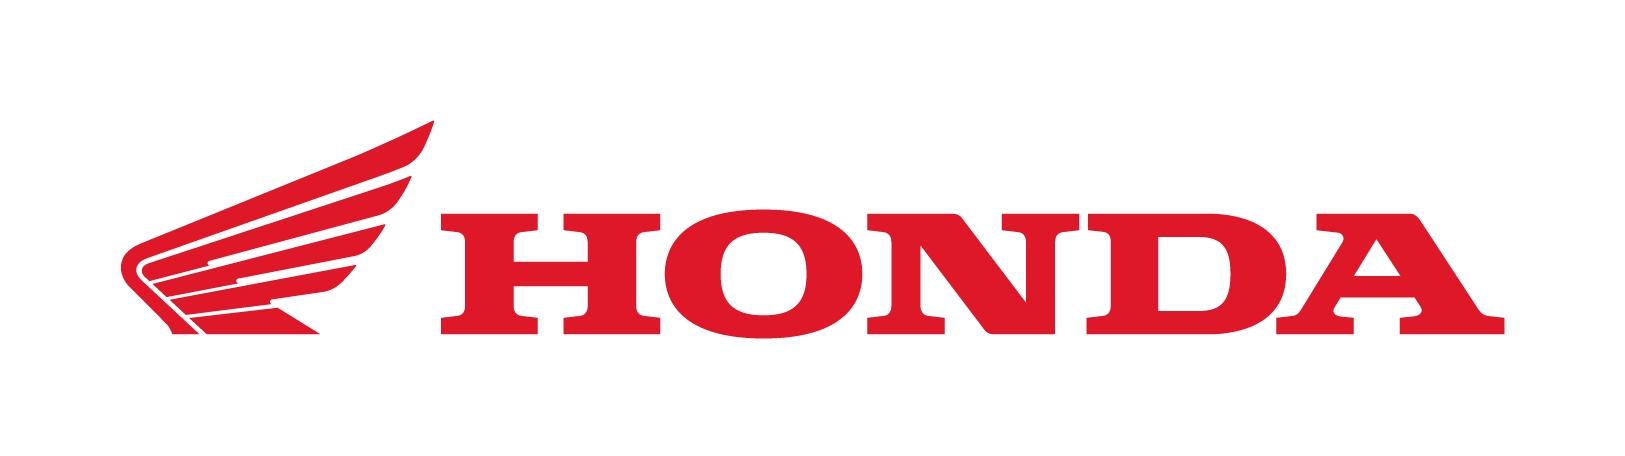 logo-honda-nyamping3 (1)